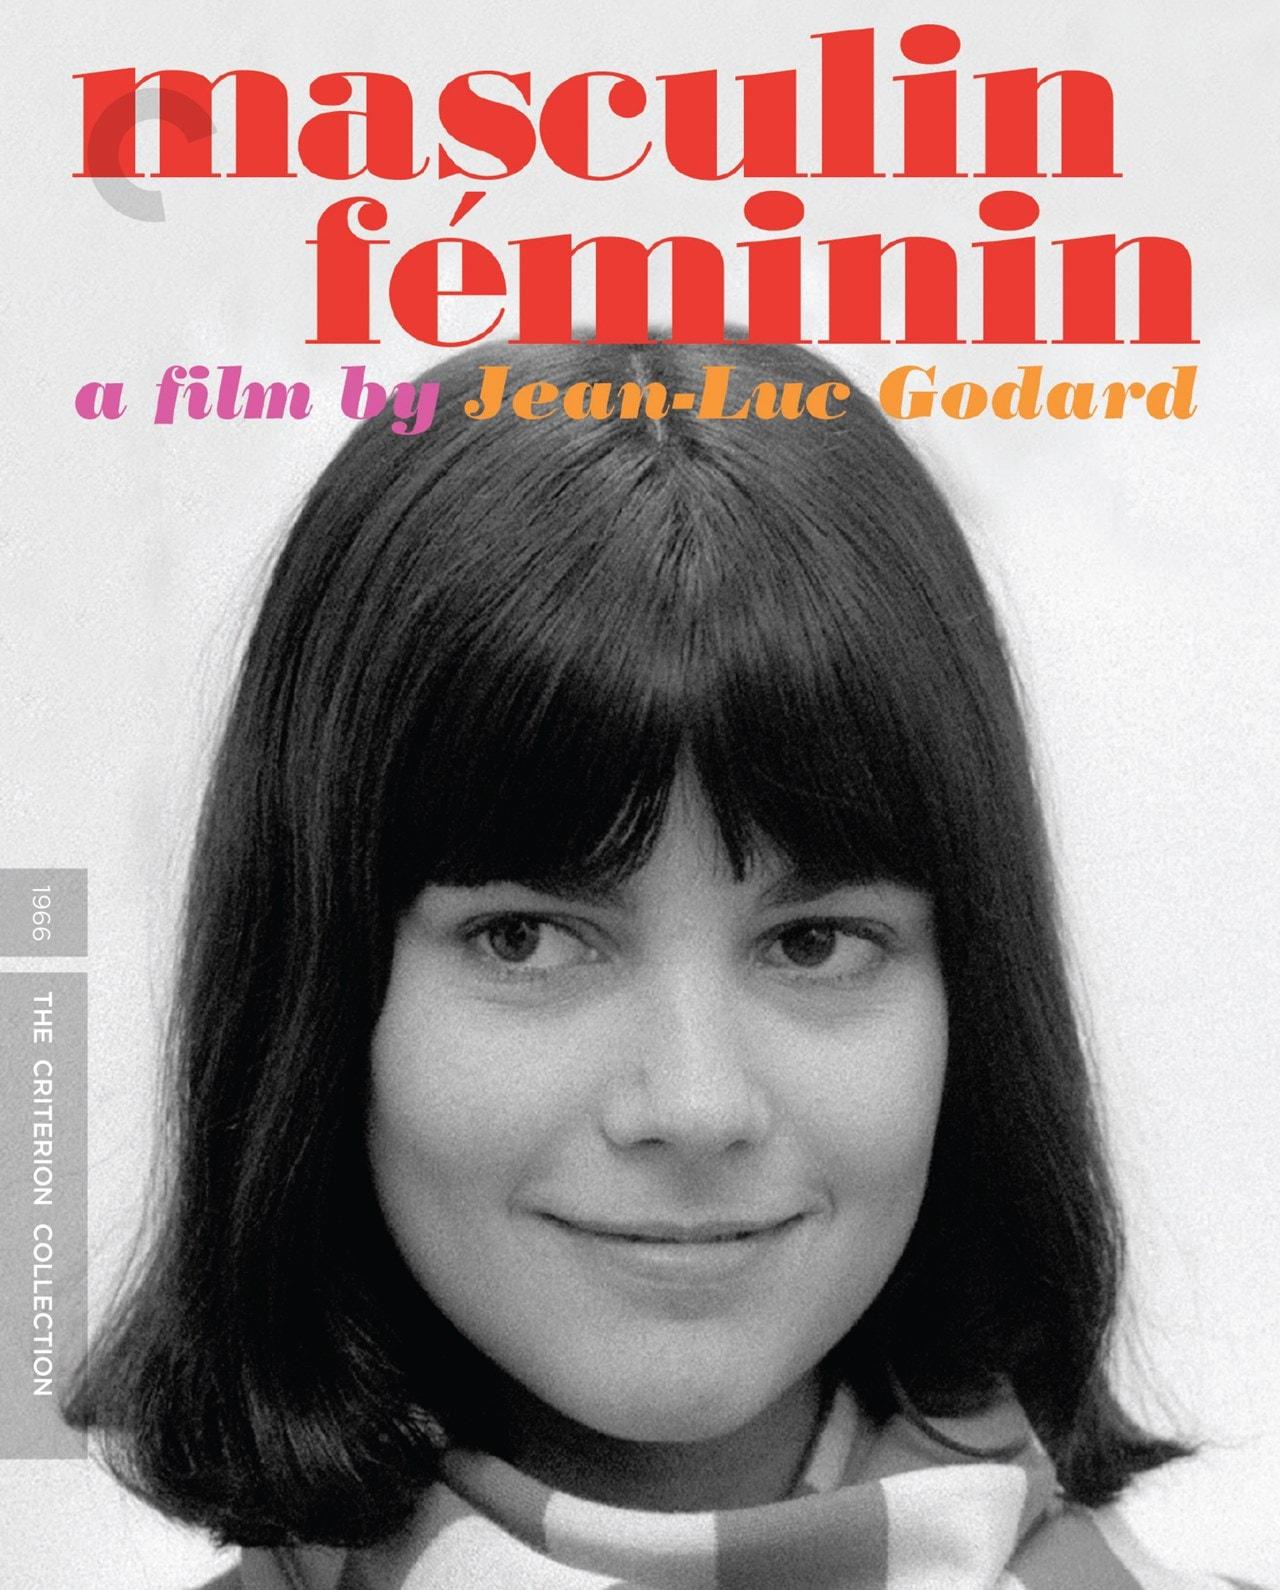 Masculin Feminin - The Criterion Collection - 1